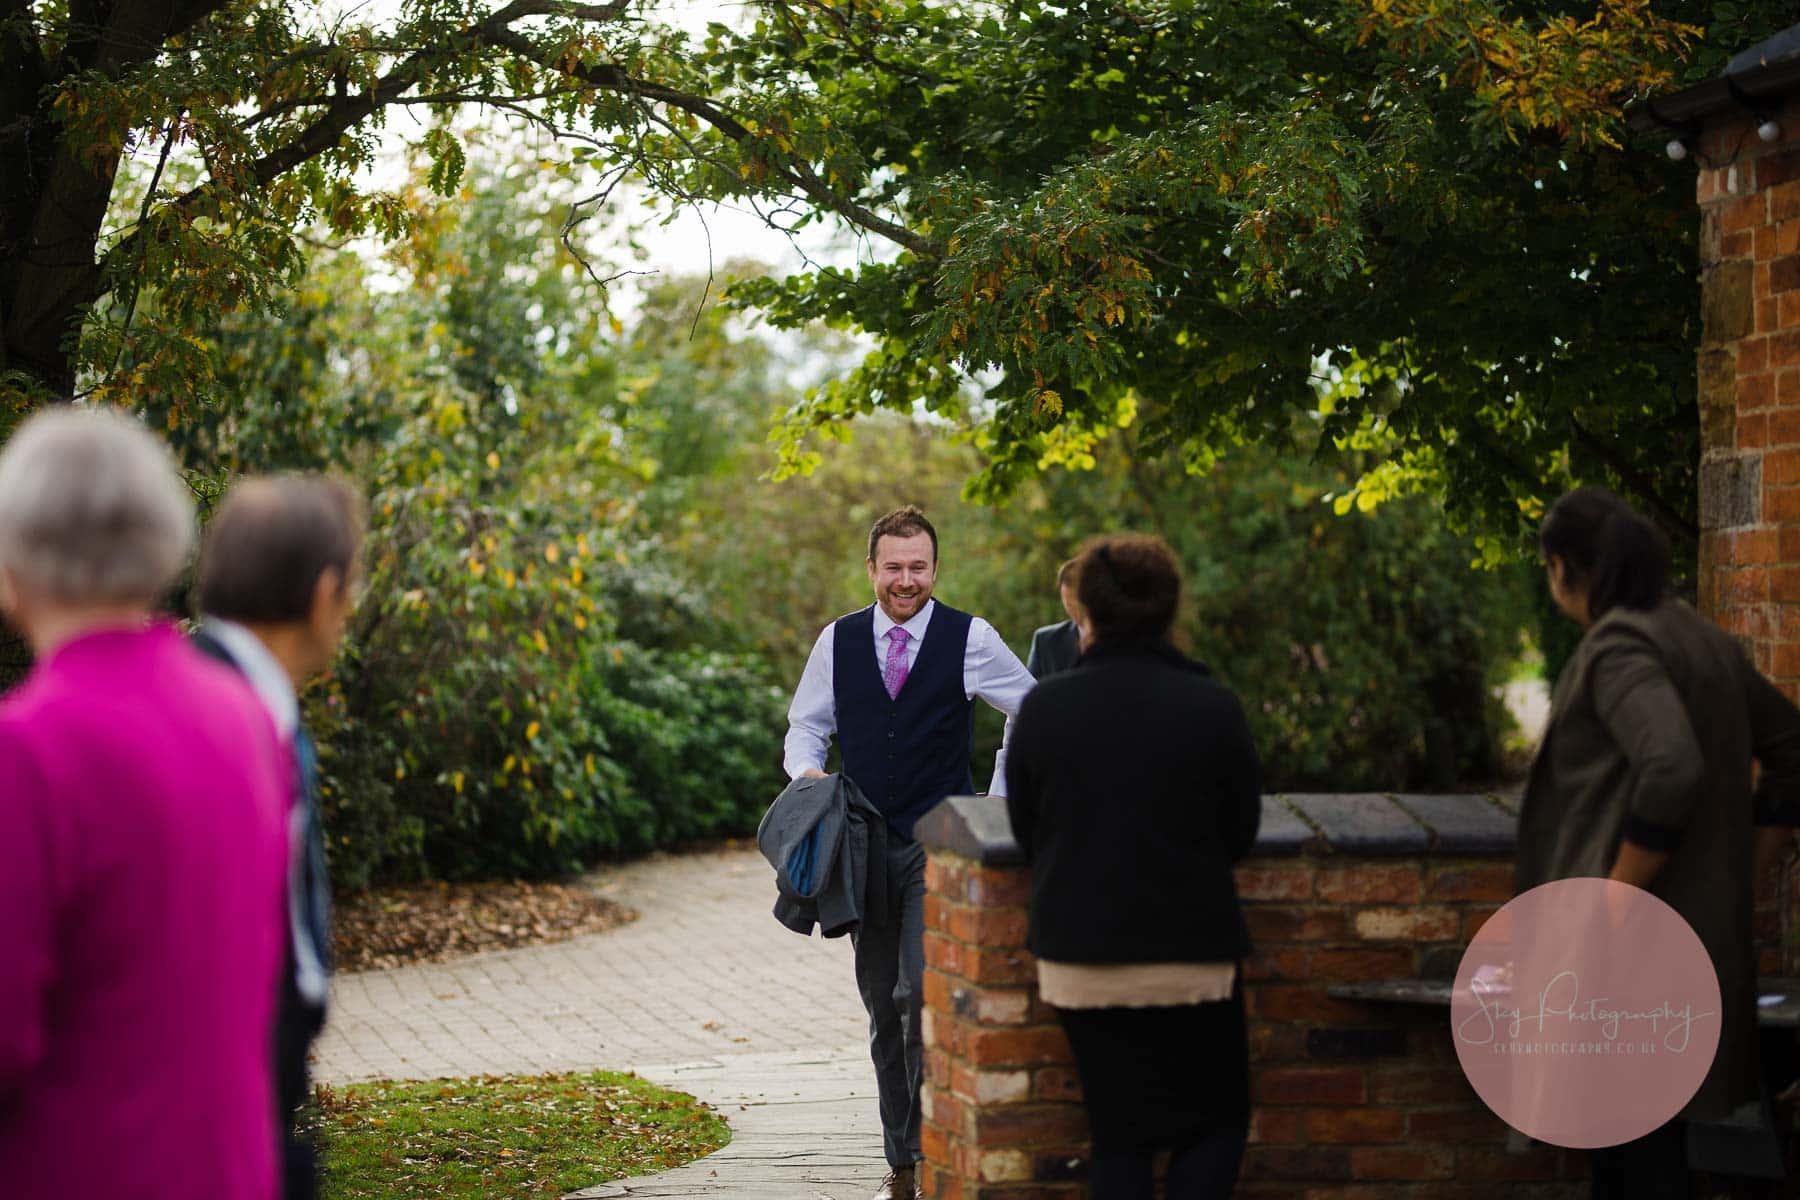 Groom arrives at the wedding venue